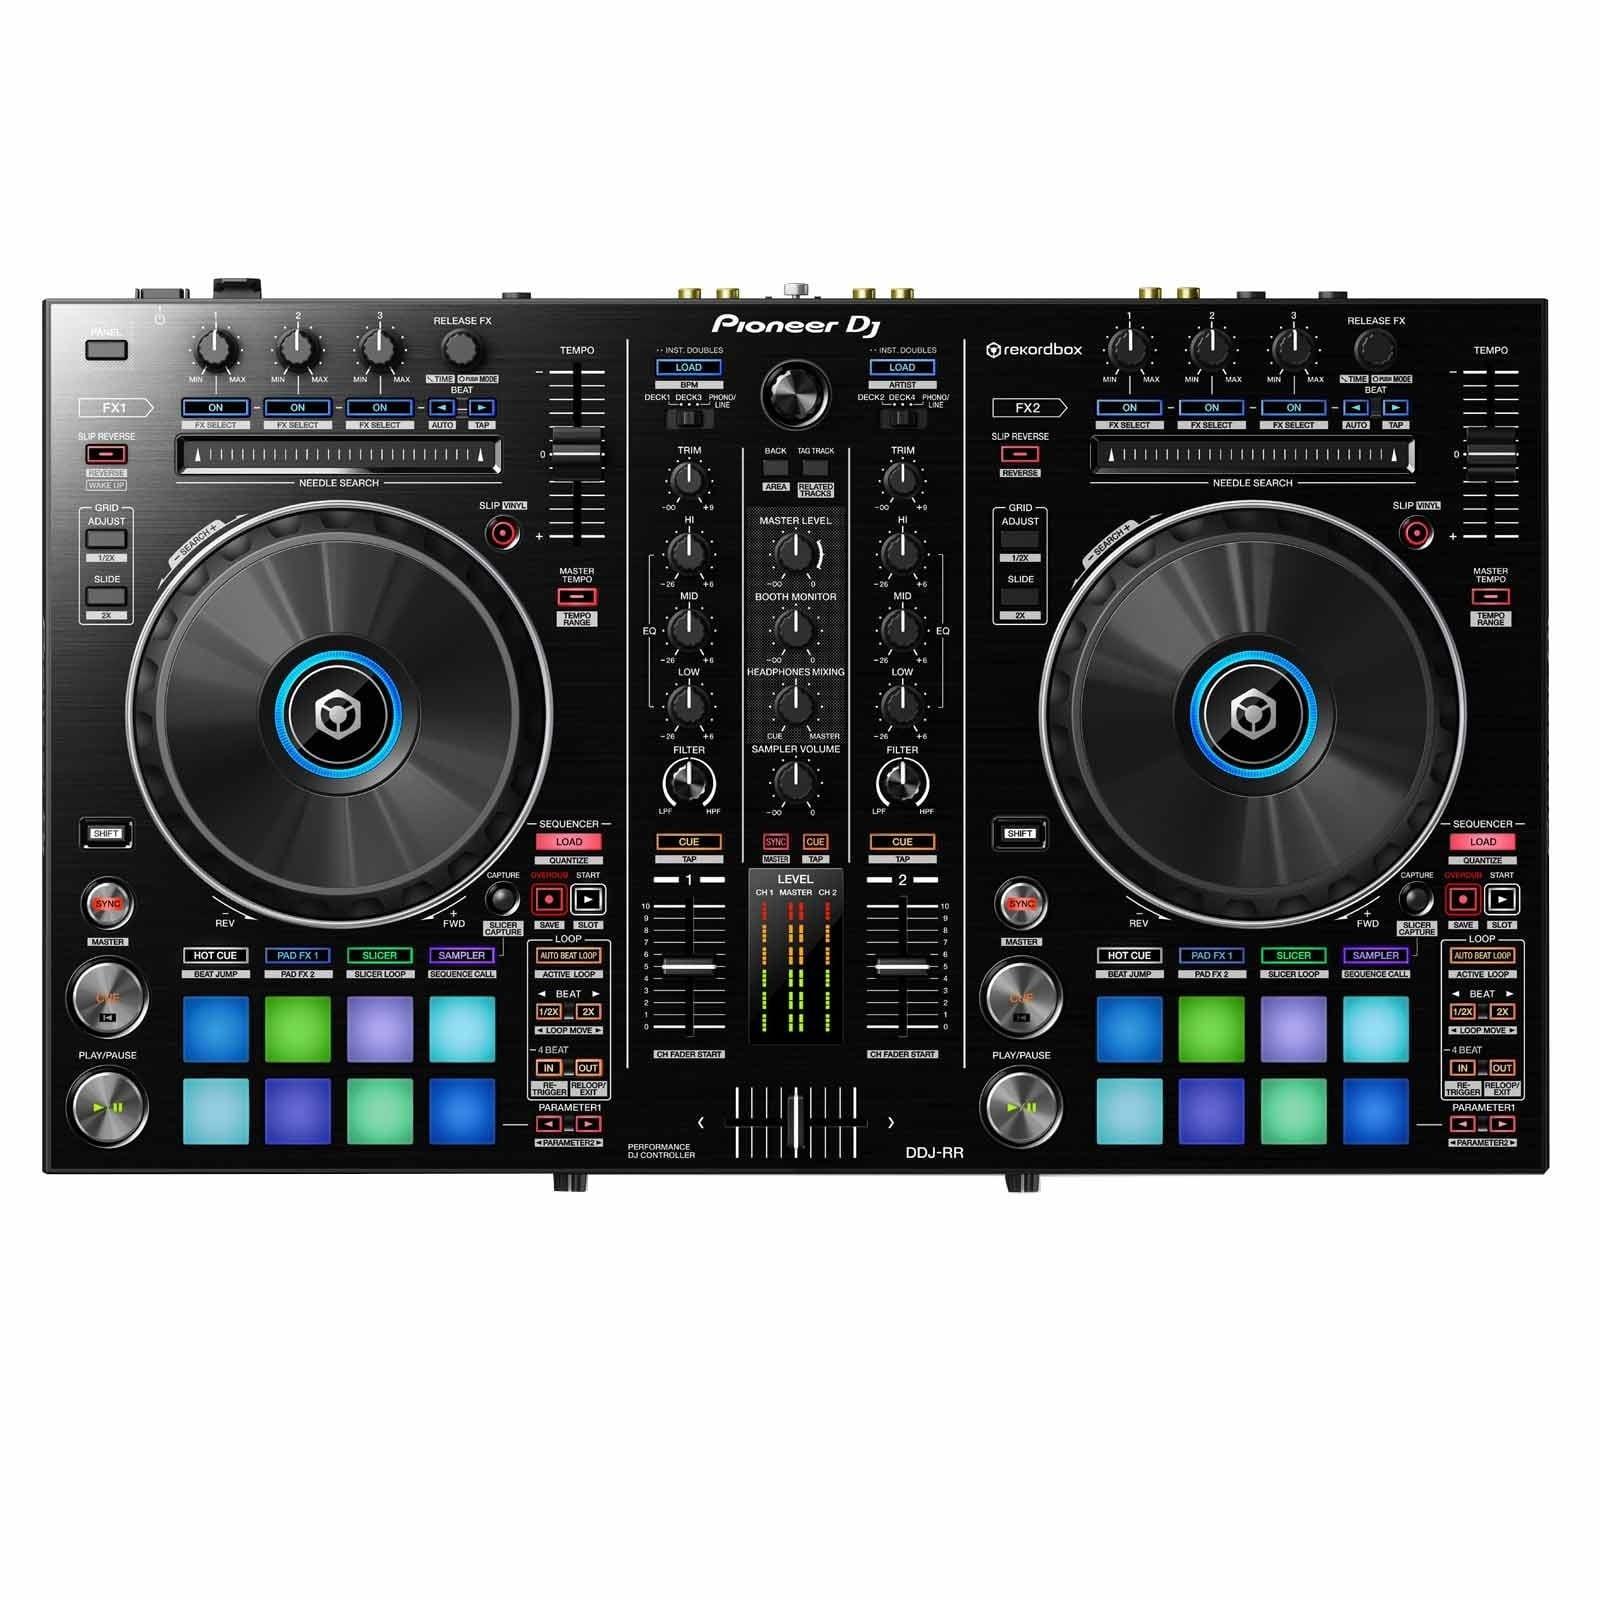 pioneer-ddj-rr-portable-2-channel-controller-for-rekordbox-dj-5a0